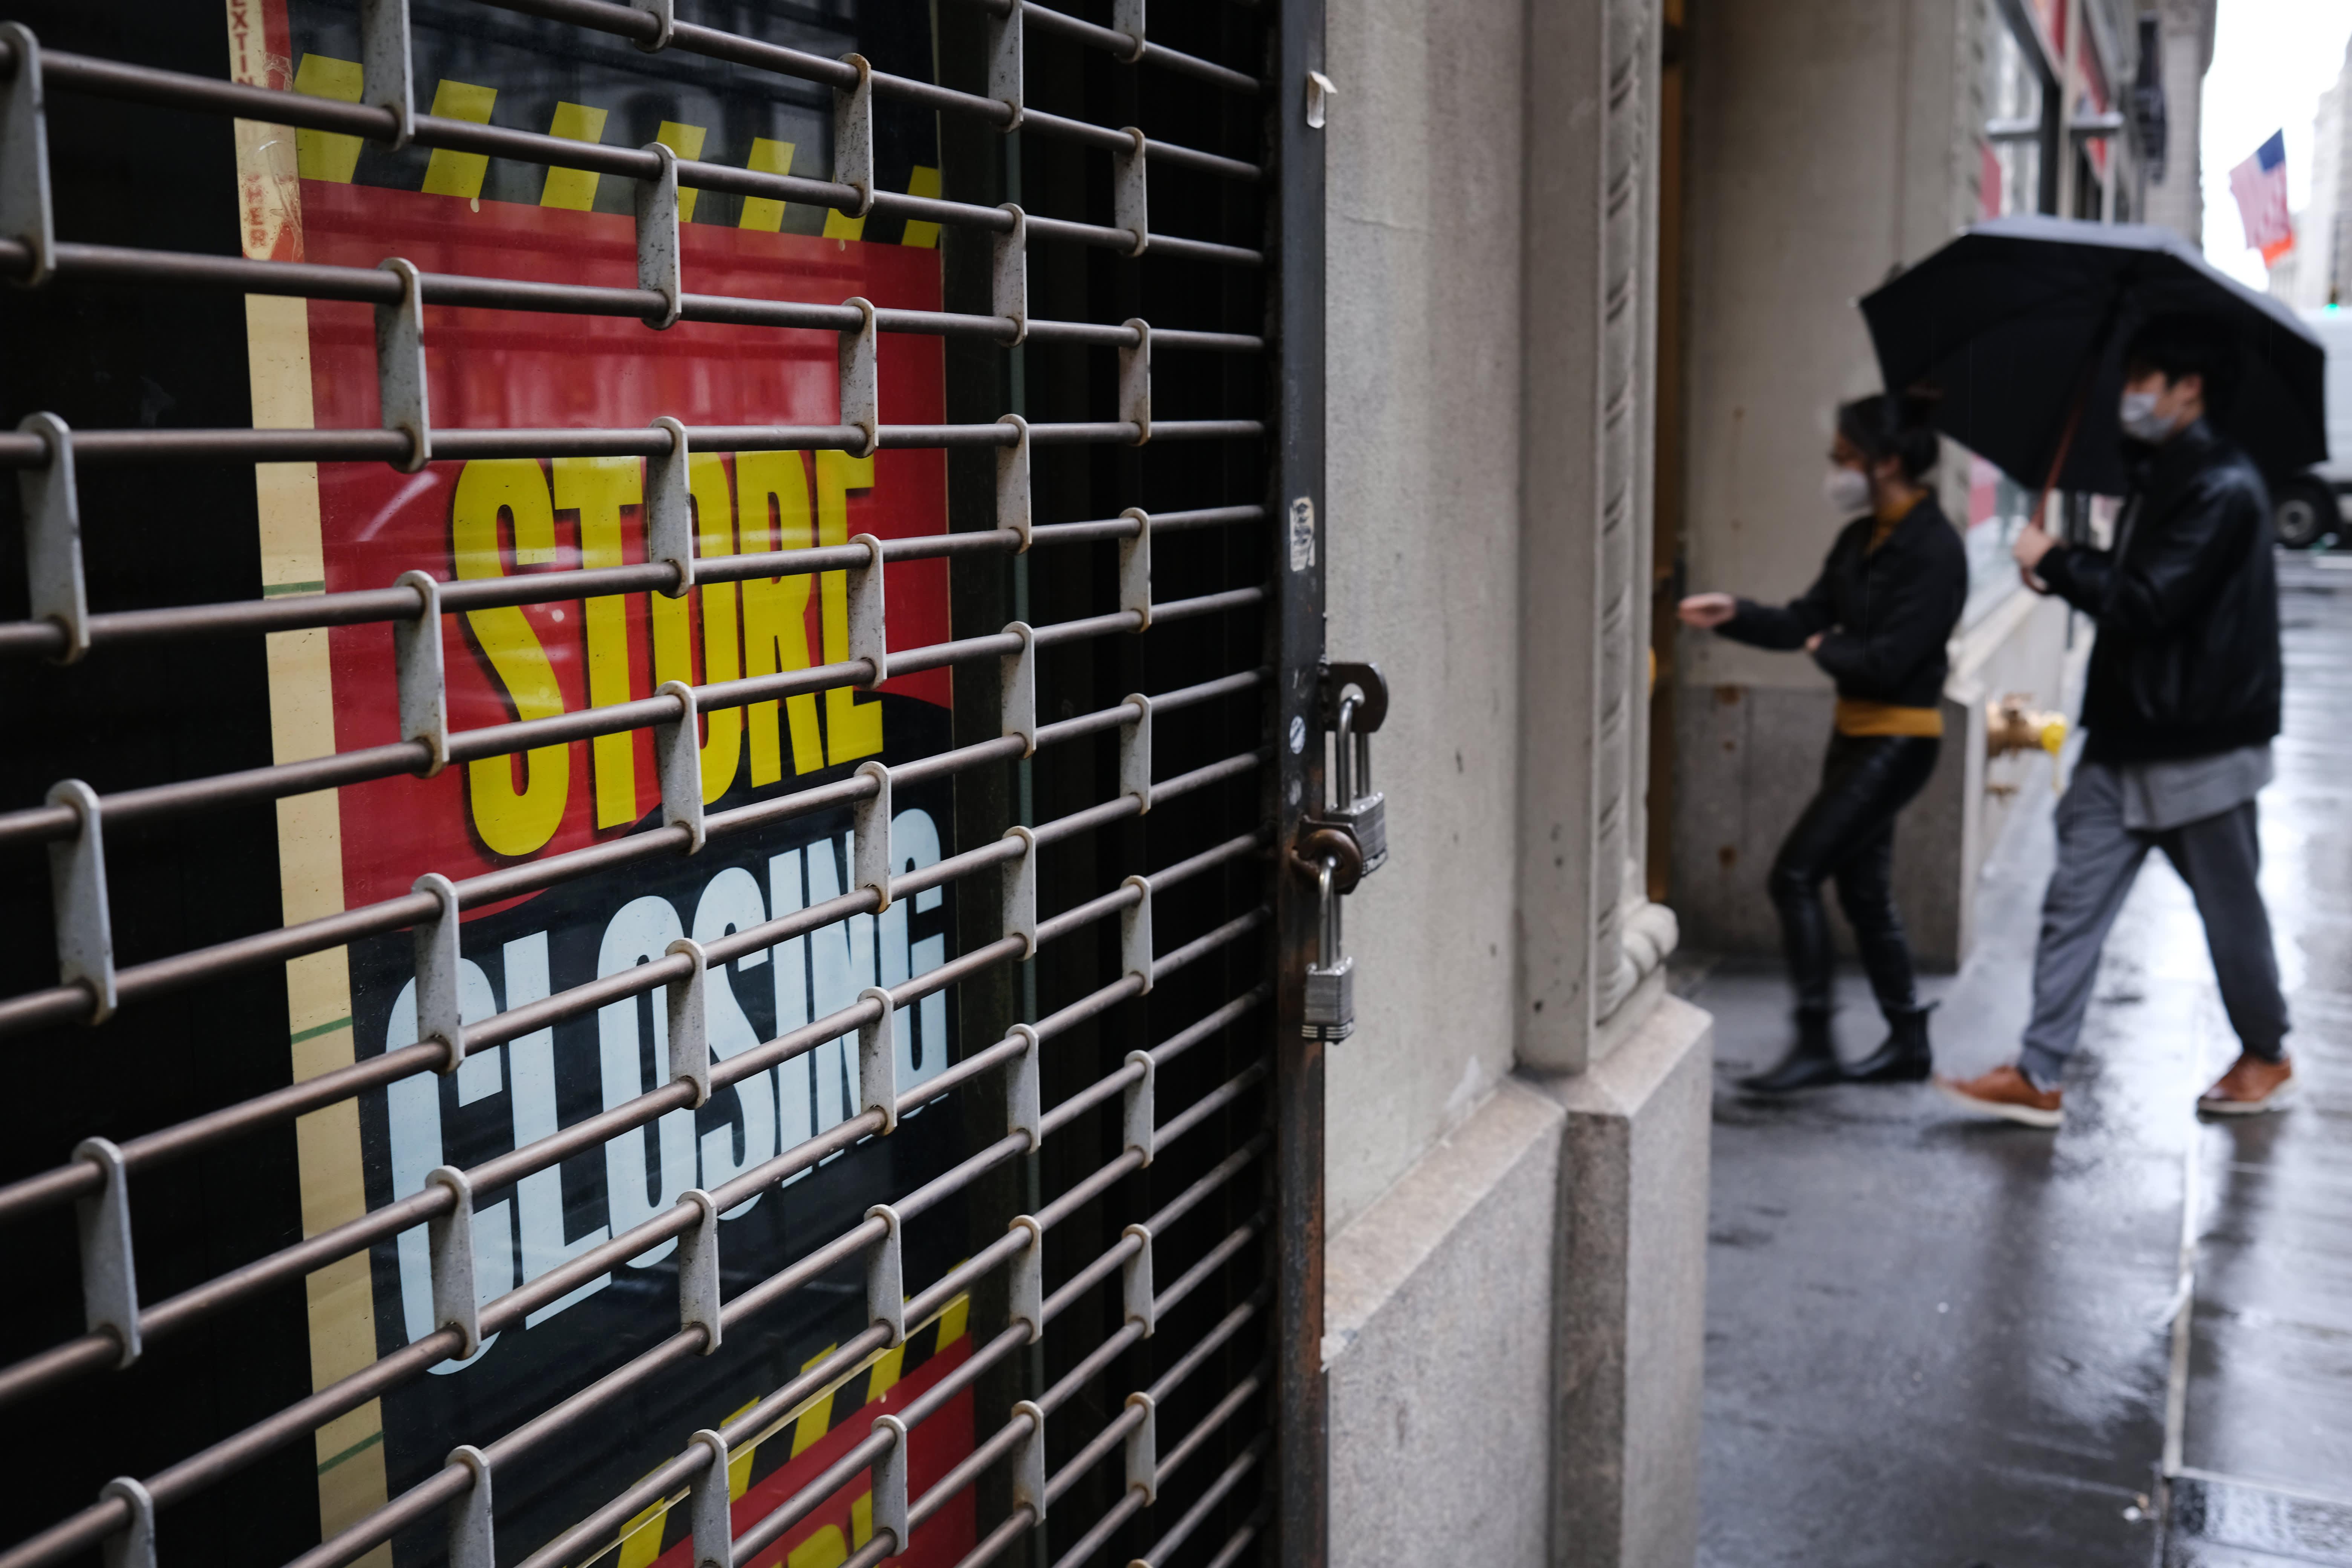 Coresight predicts record 25,000 retail stores will close in 2020